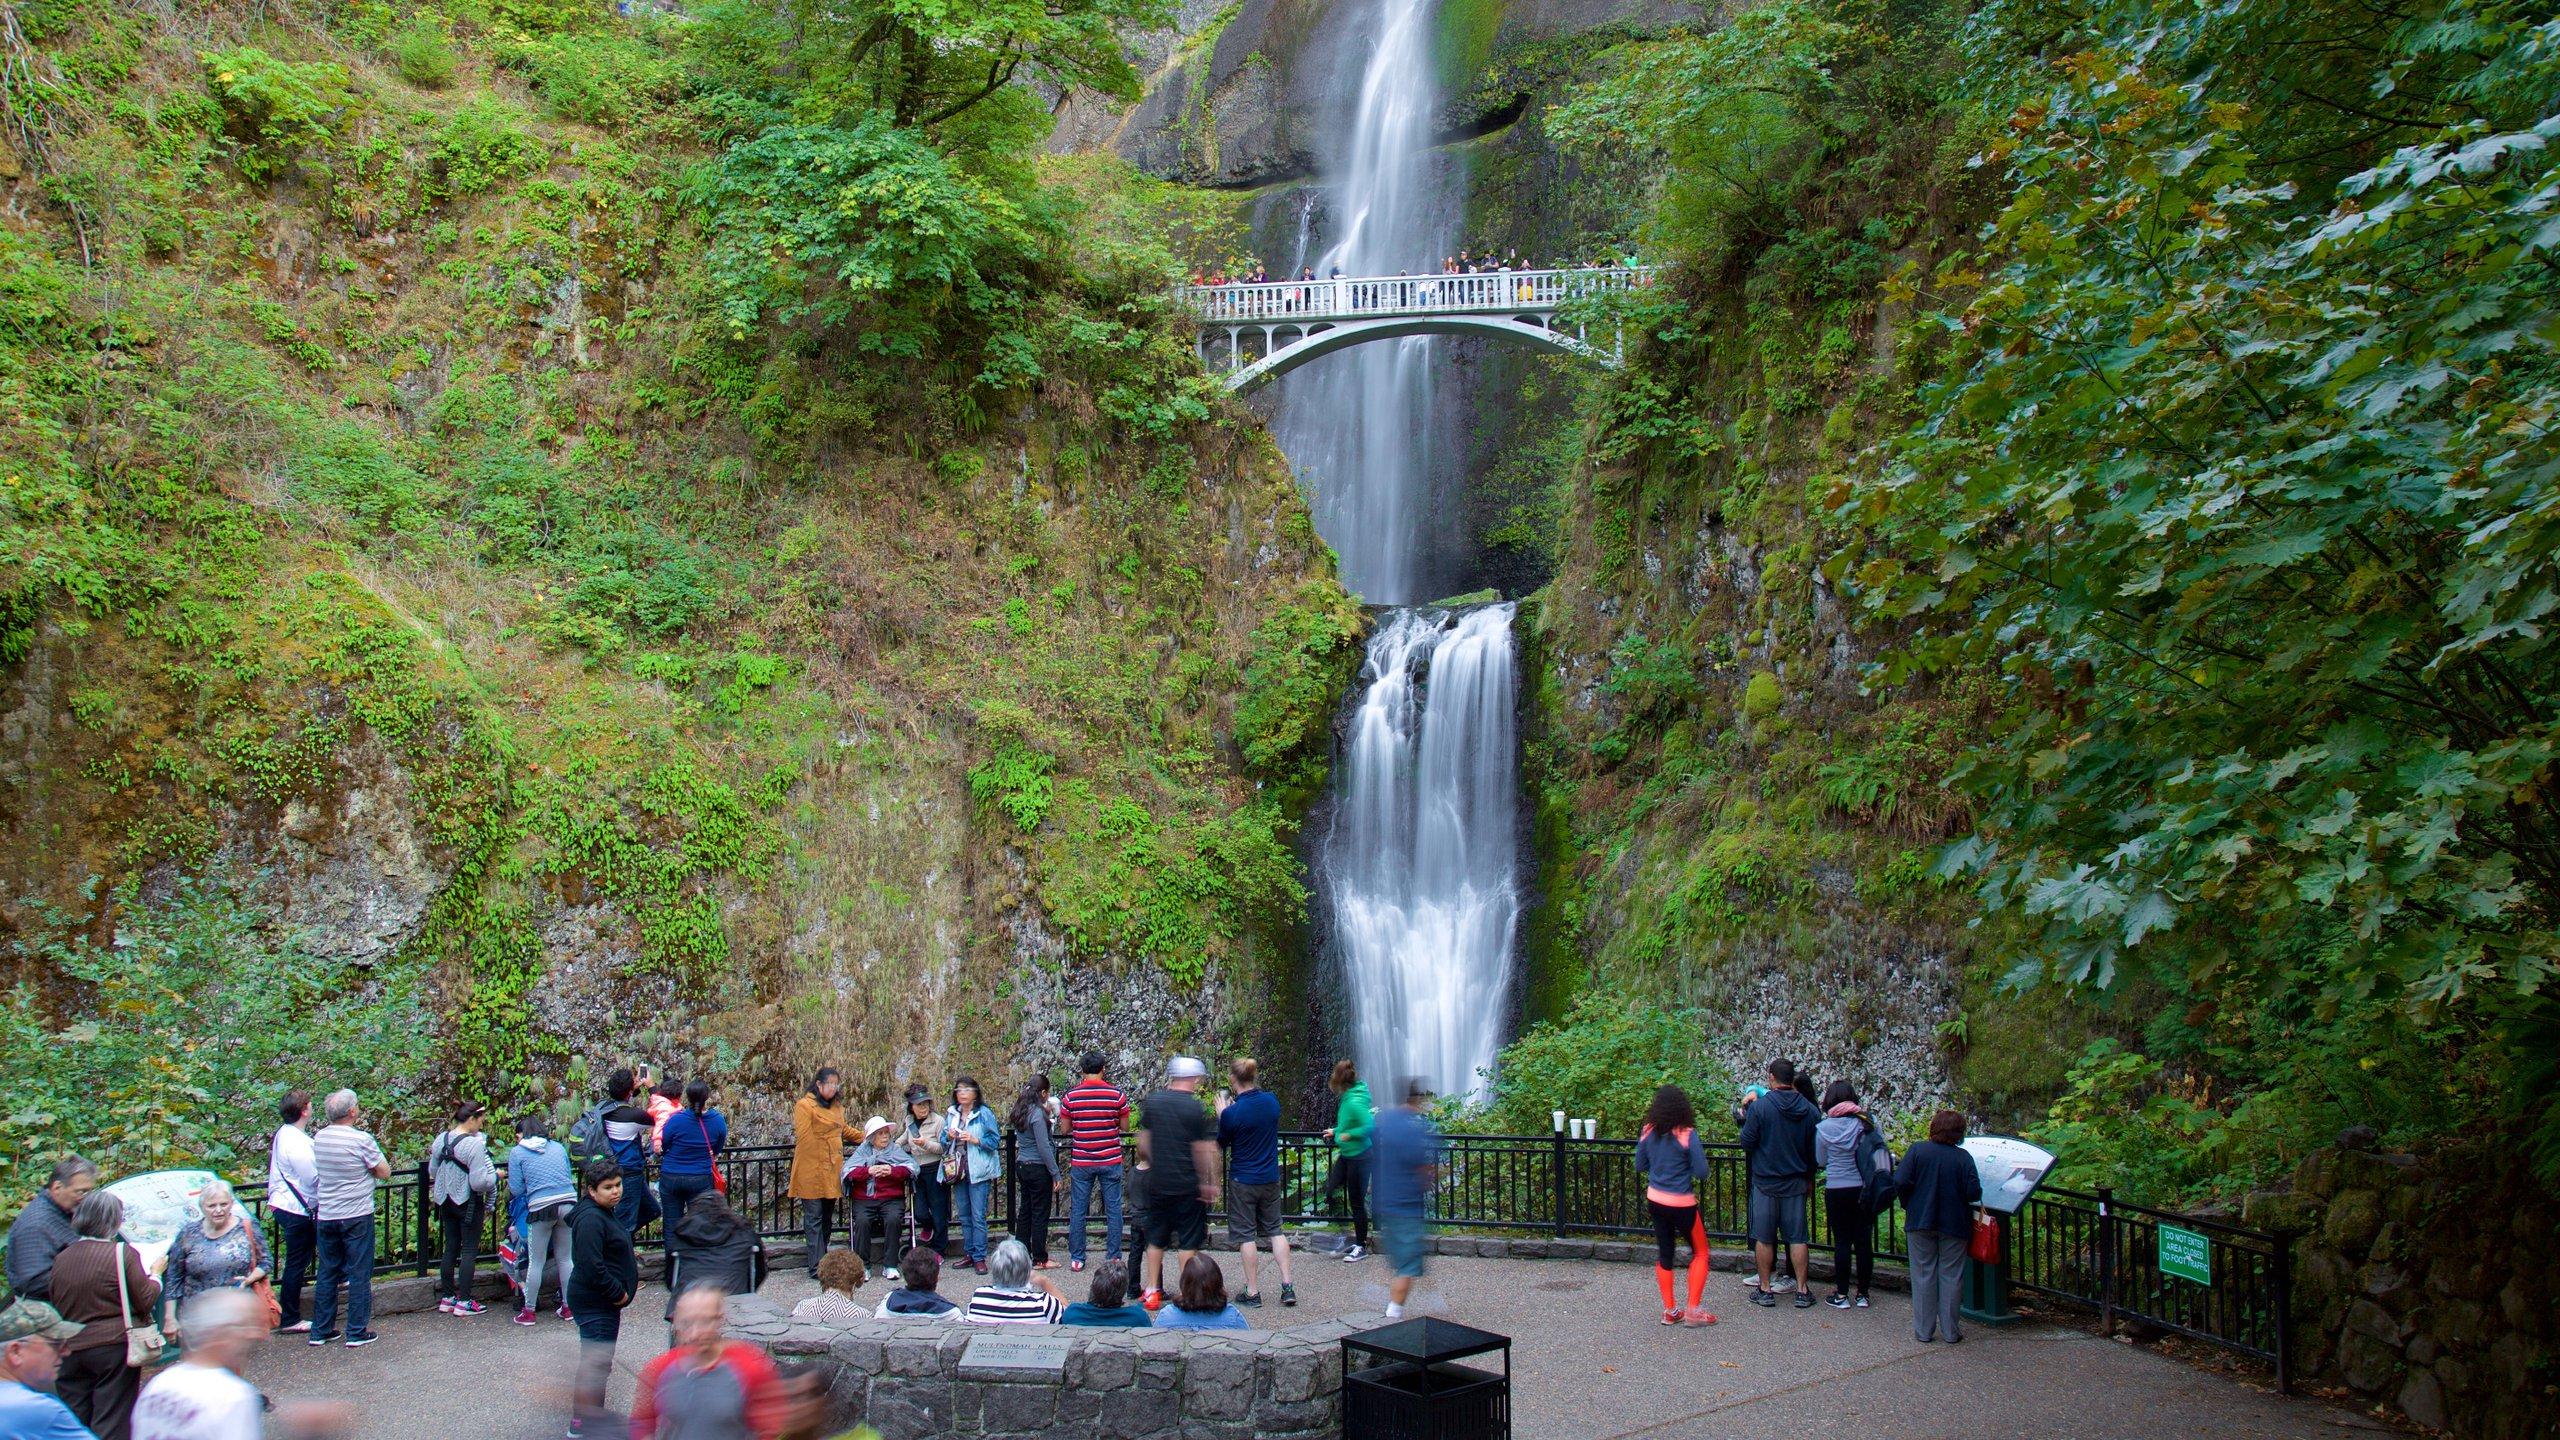 Multnomah Falls, Corbett, Oregon, United States of America